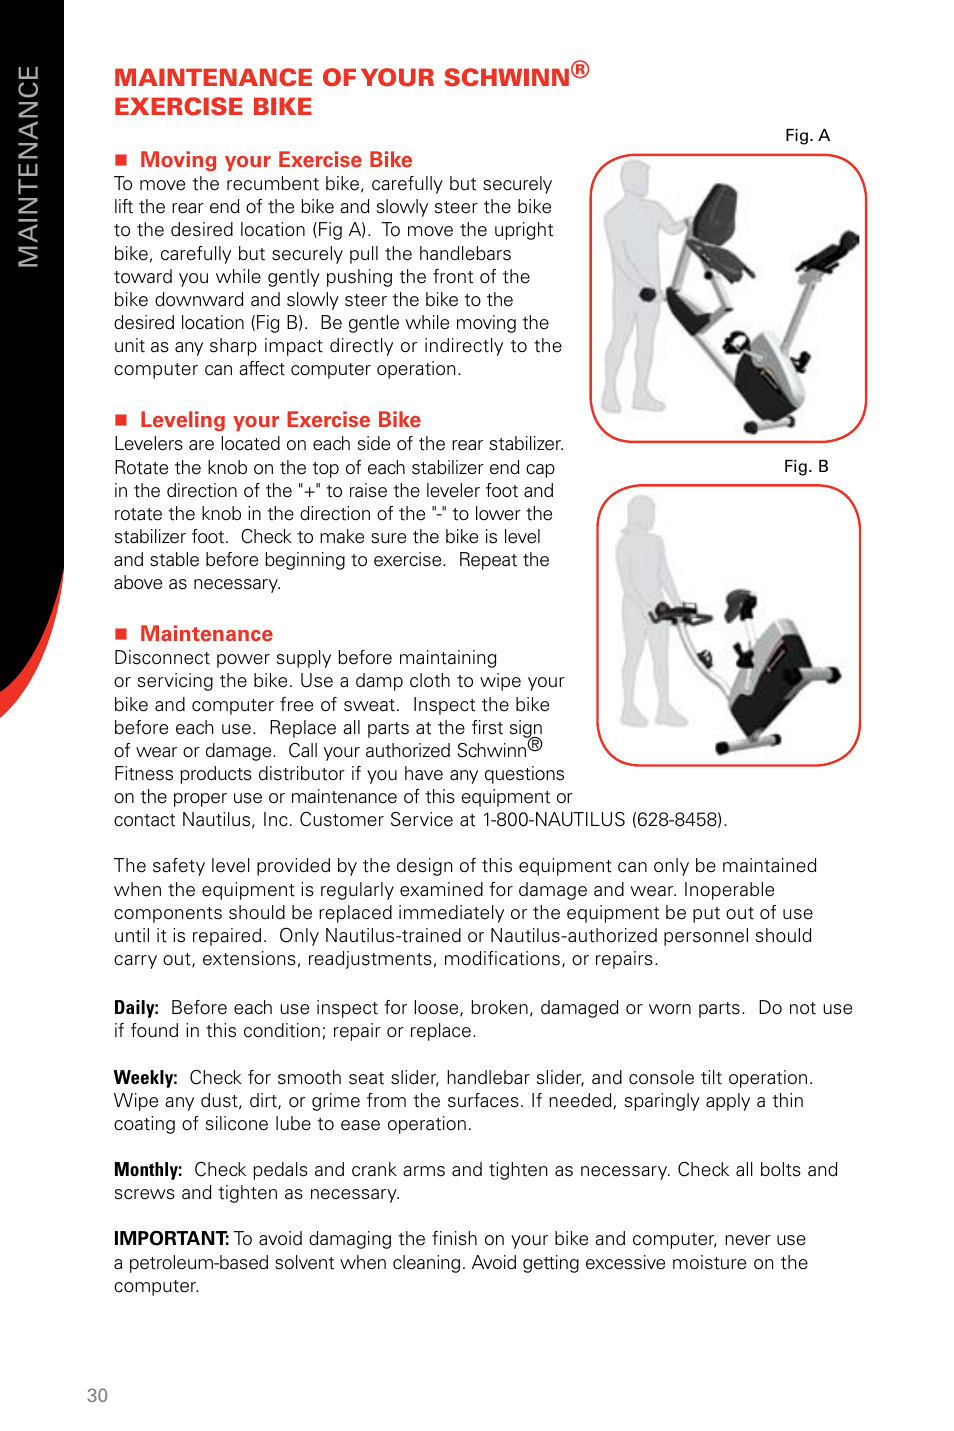 Maintenance of your schwinn® exercise bike | Schwinn SR23